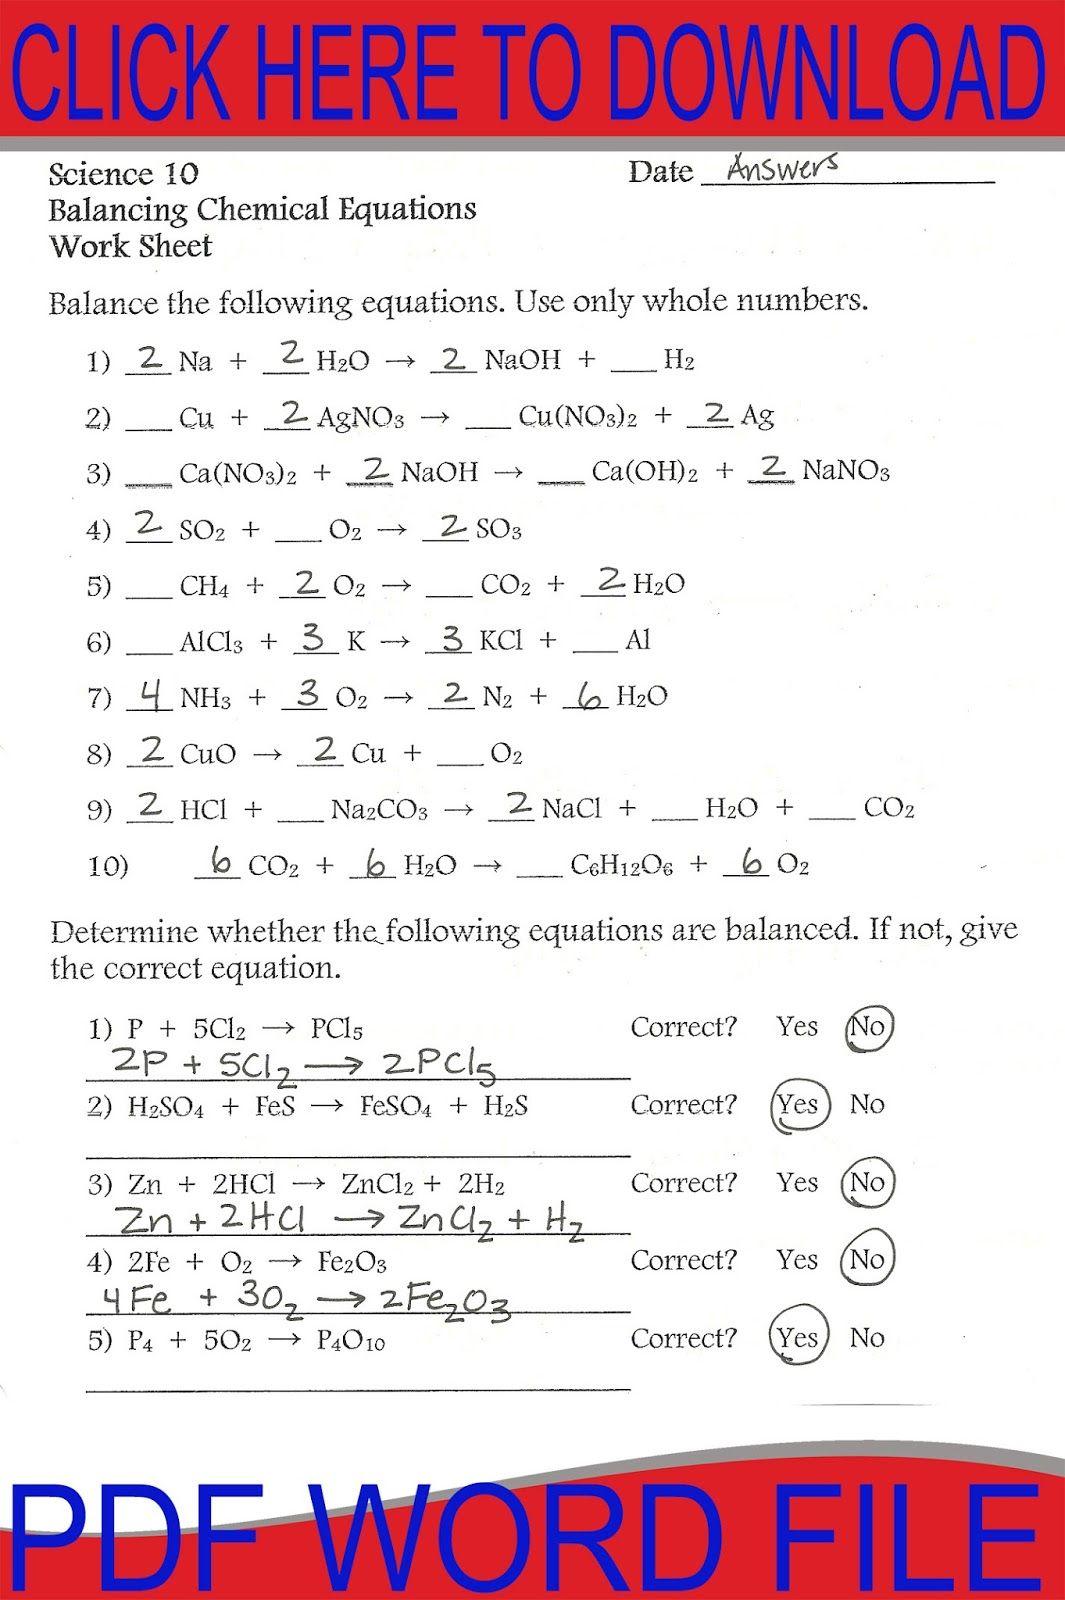 Balancing Equations Worksheet workouts Pinterest